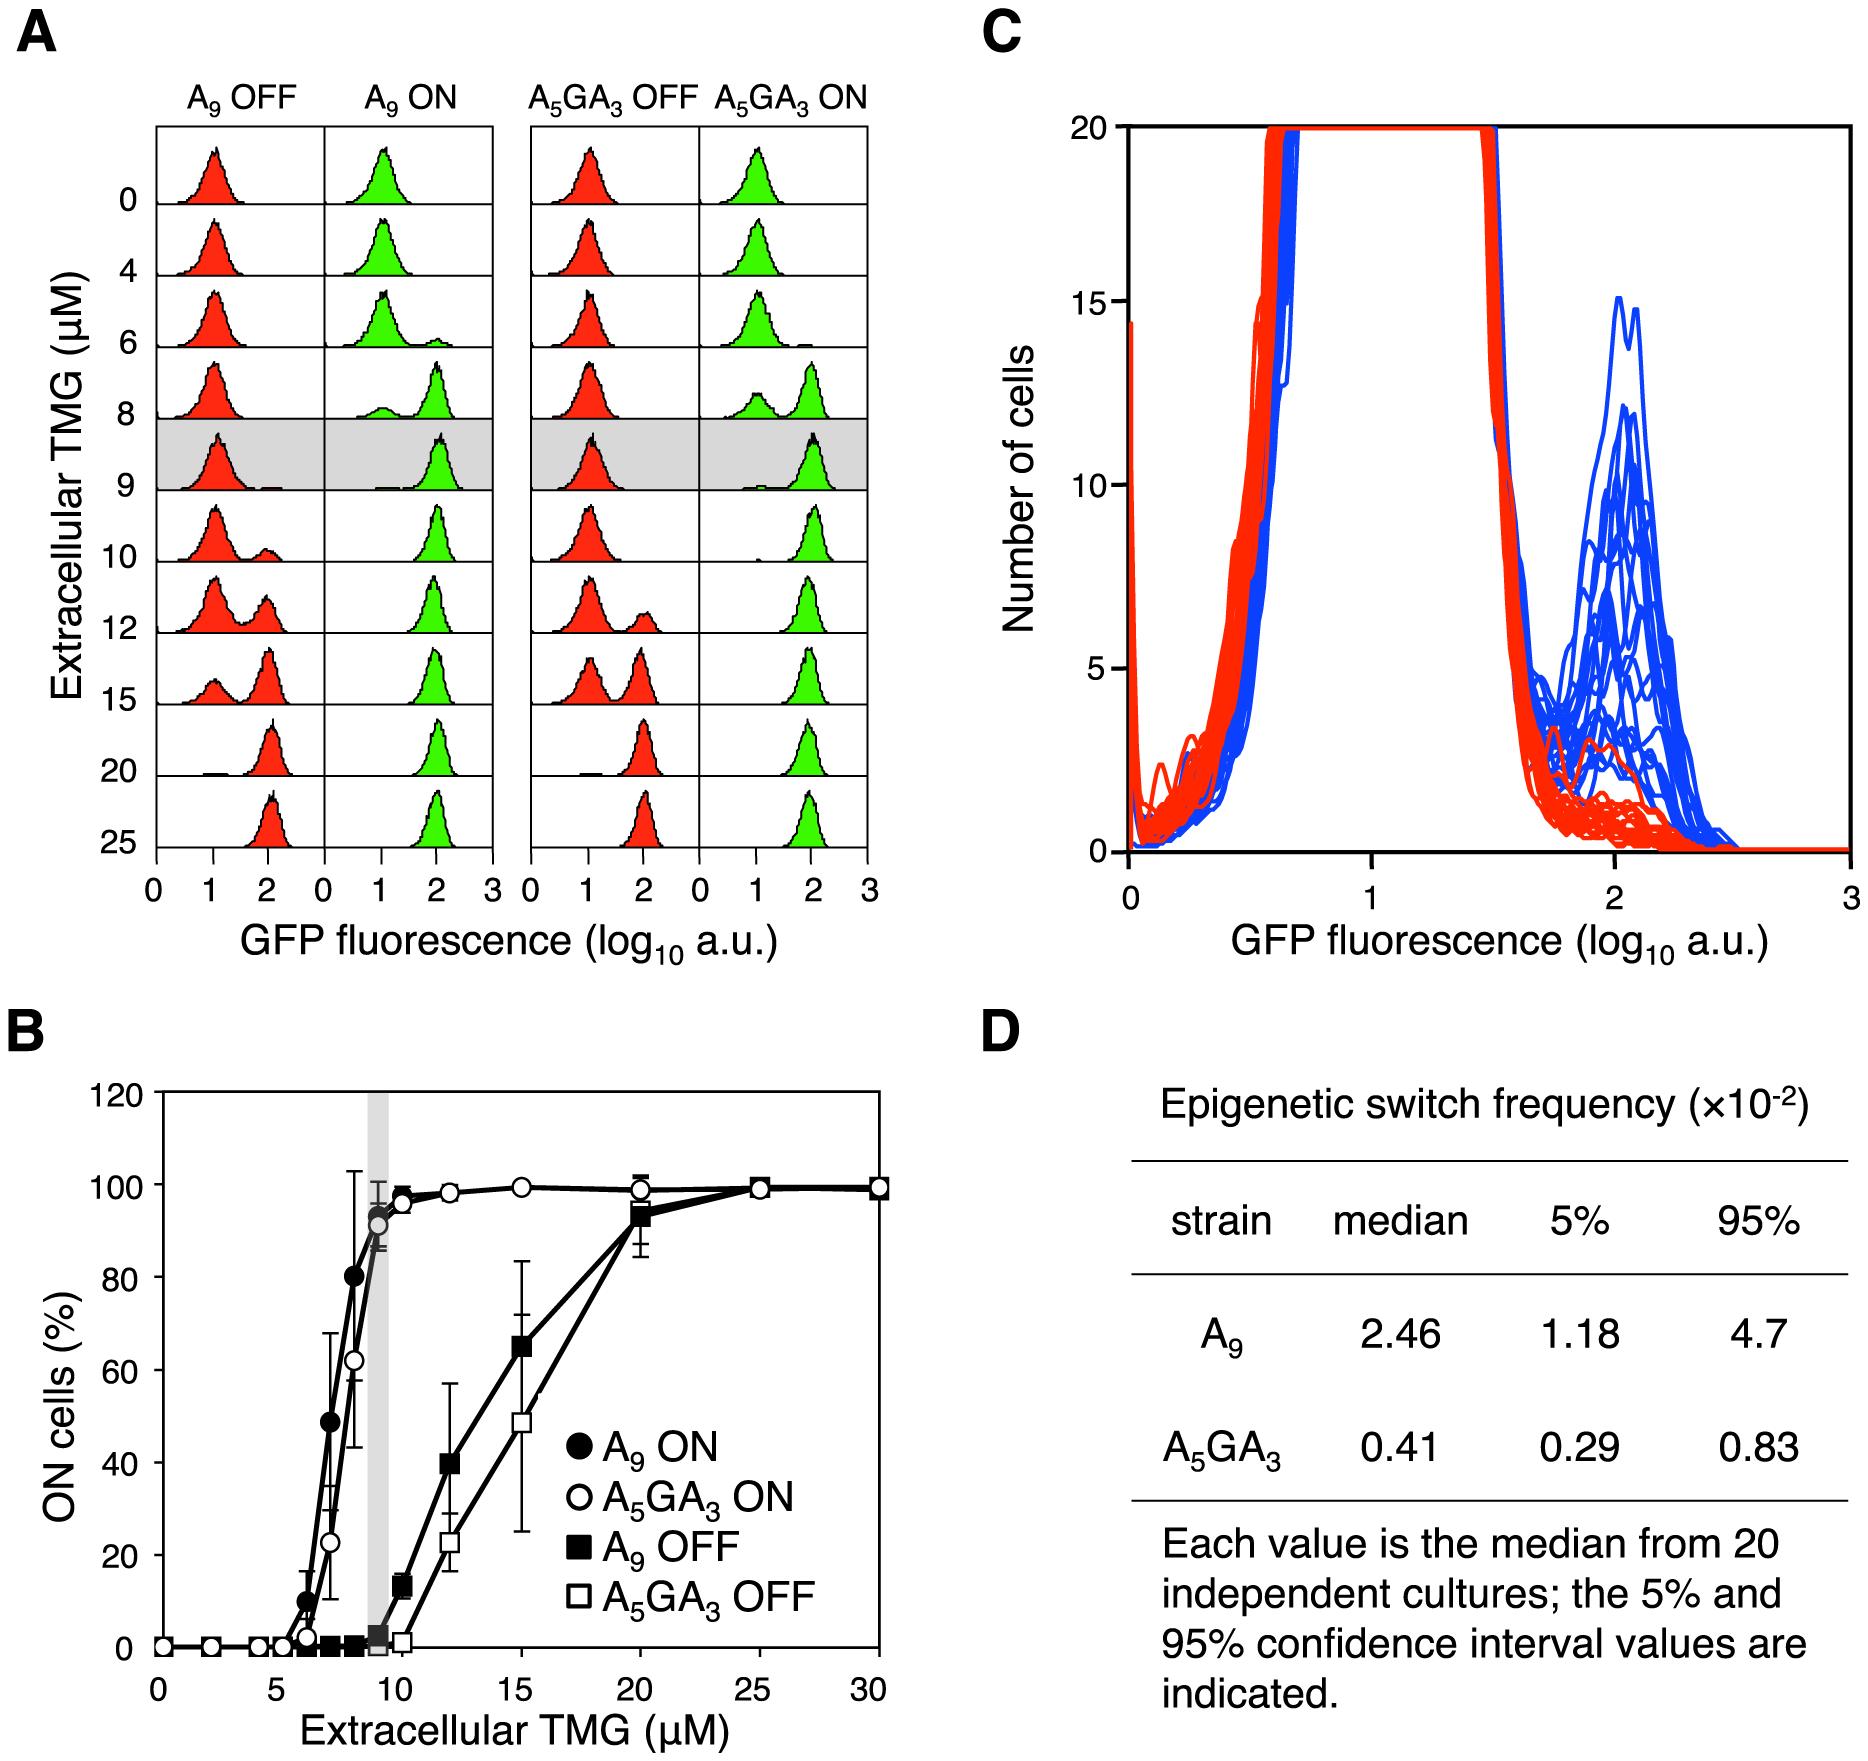 The error-prone A<sub>9</sub> run in the <i>lacI</i> transcript increases stochastic phenotypic switching.